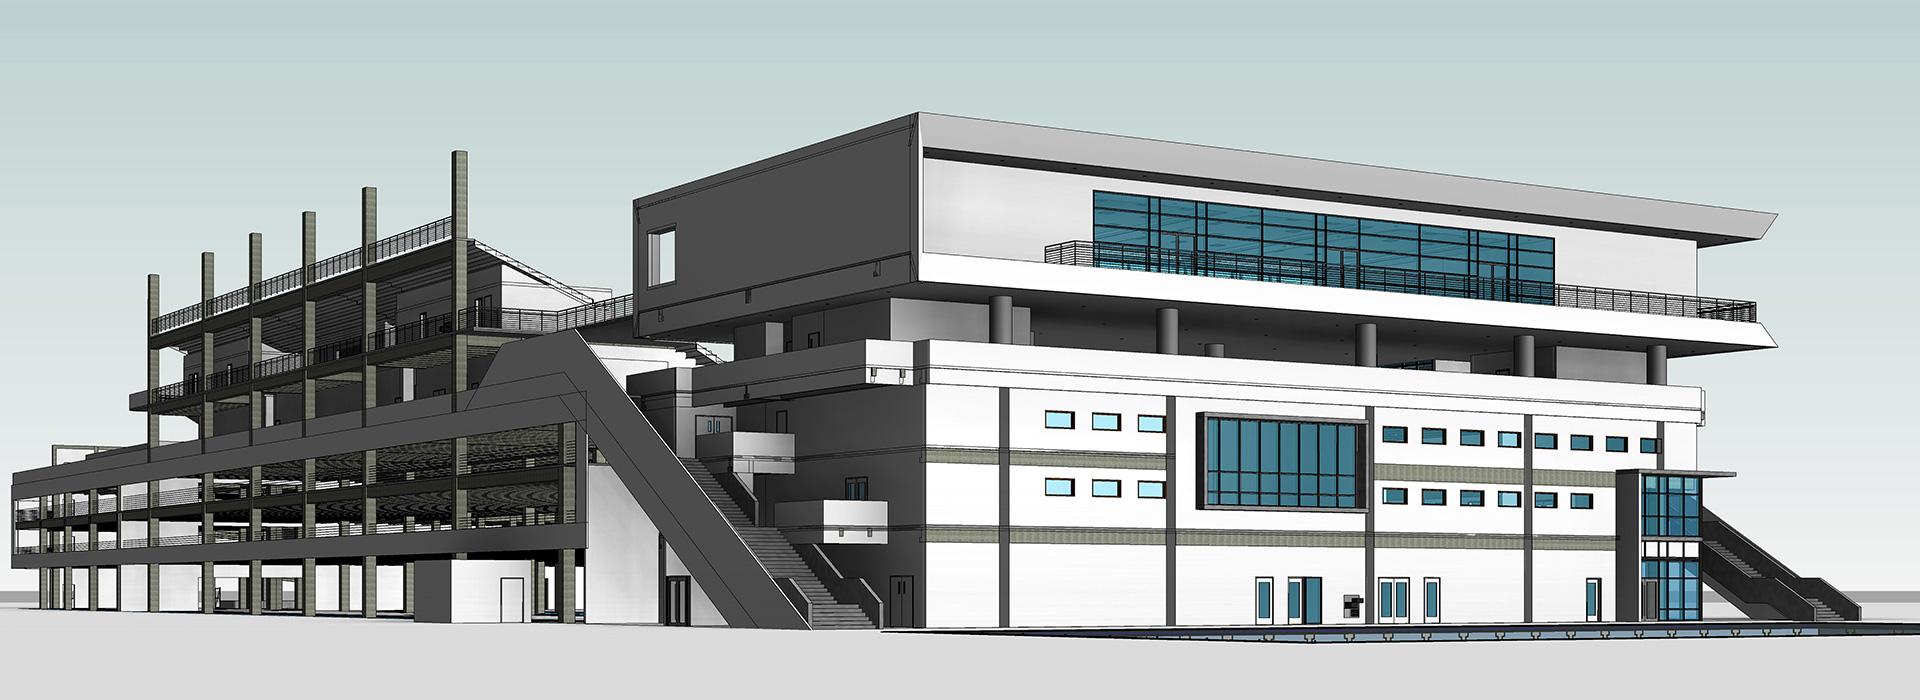 Revit-3D-Architectural-BIM-Model-Commercial-Modeling-by-United-BIM